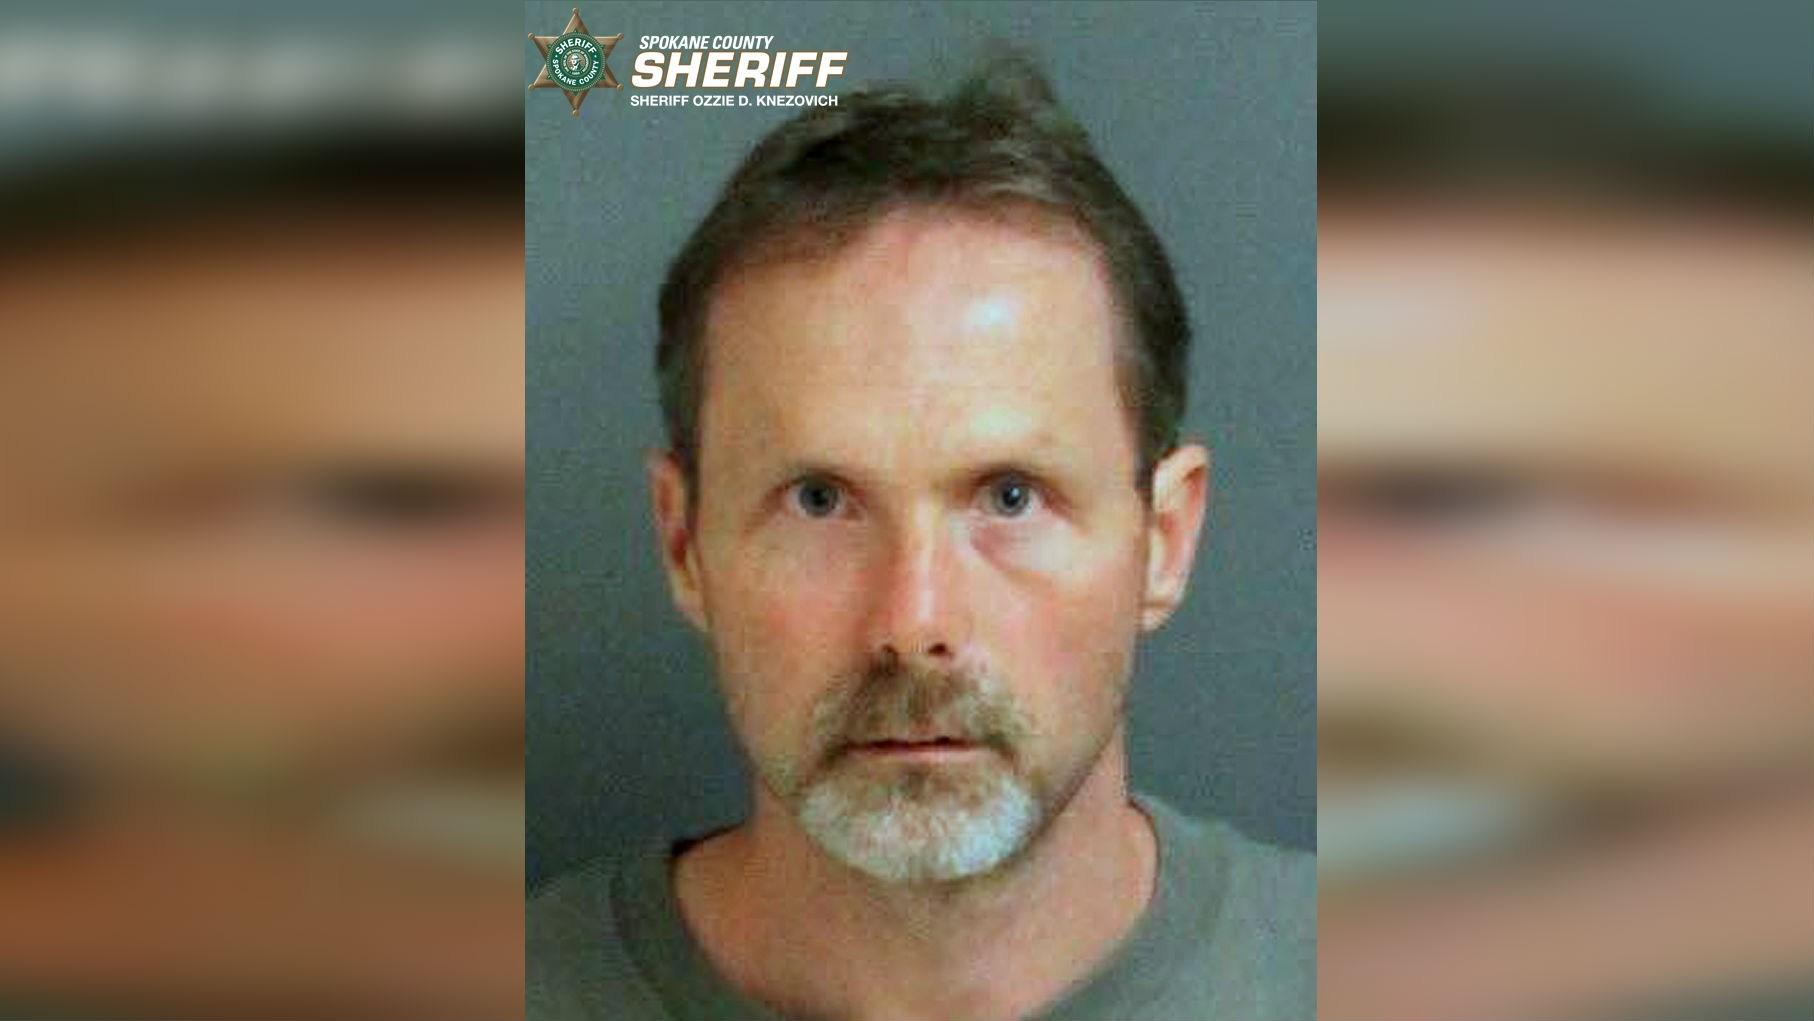 47-year-old Level III sex offender Sean Tillman is now living in Spokane